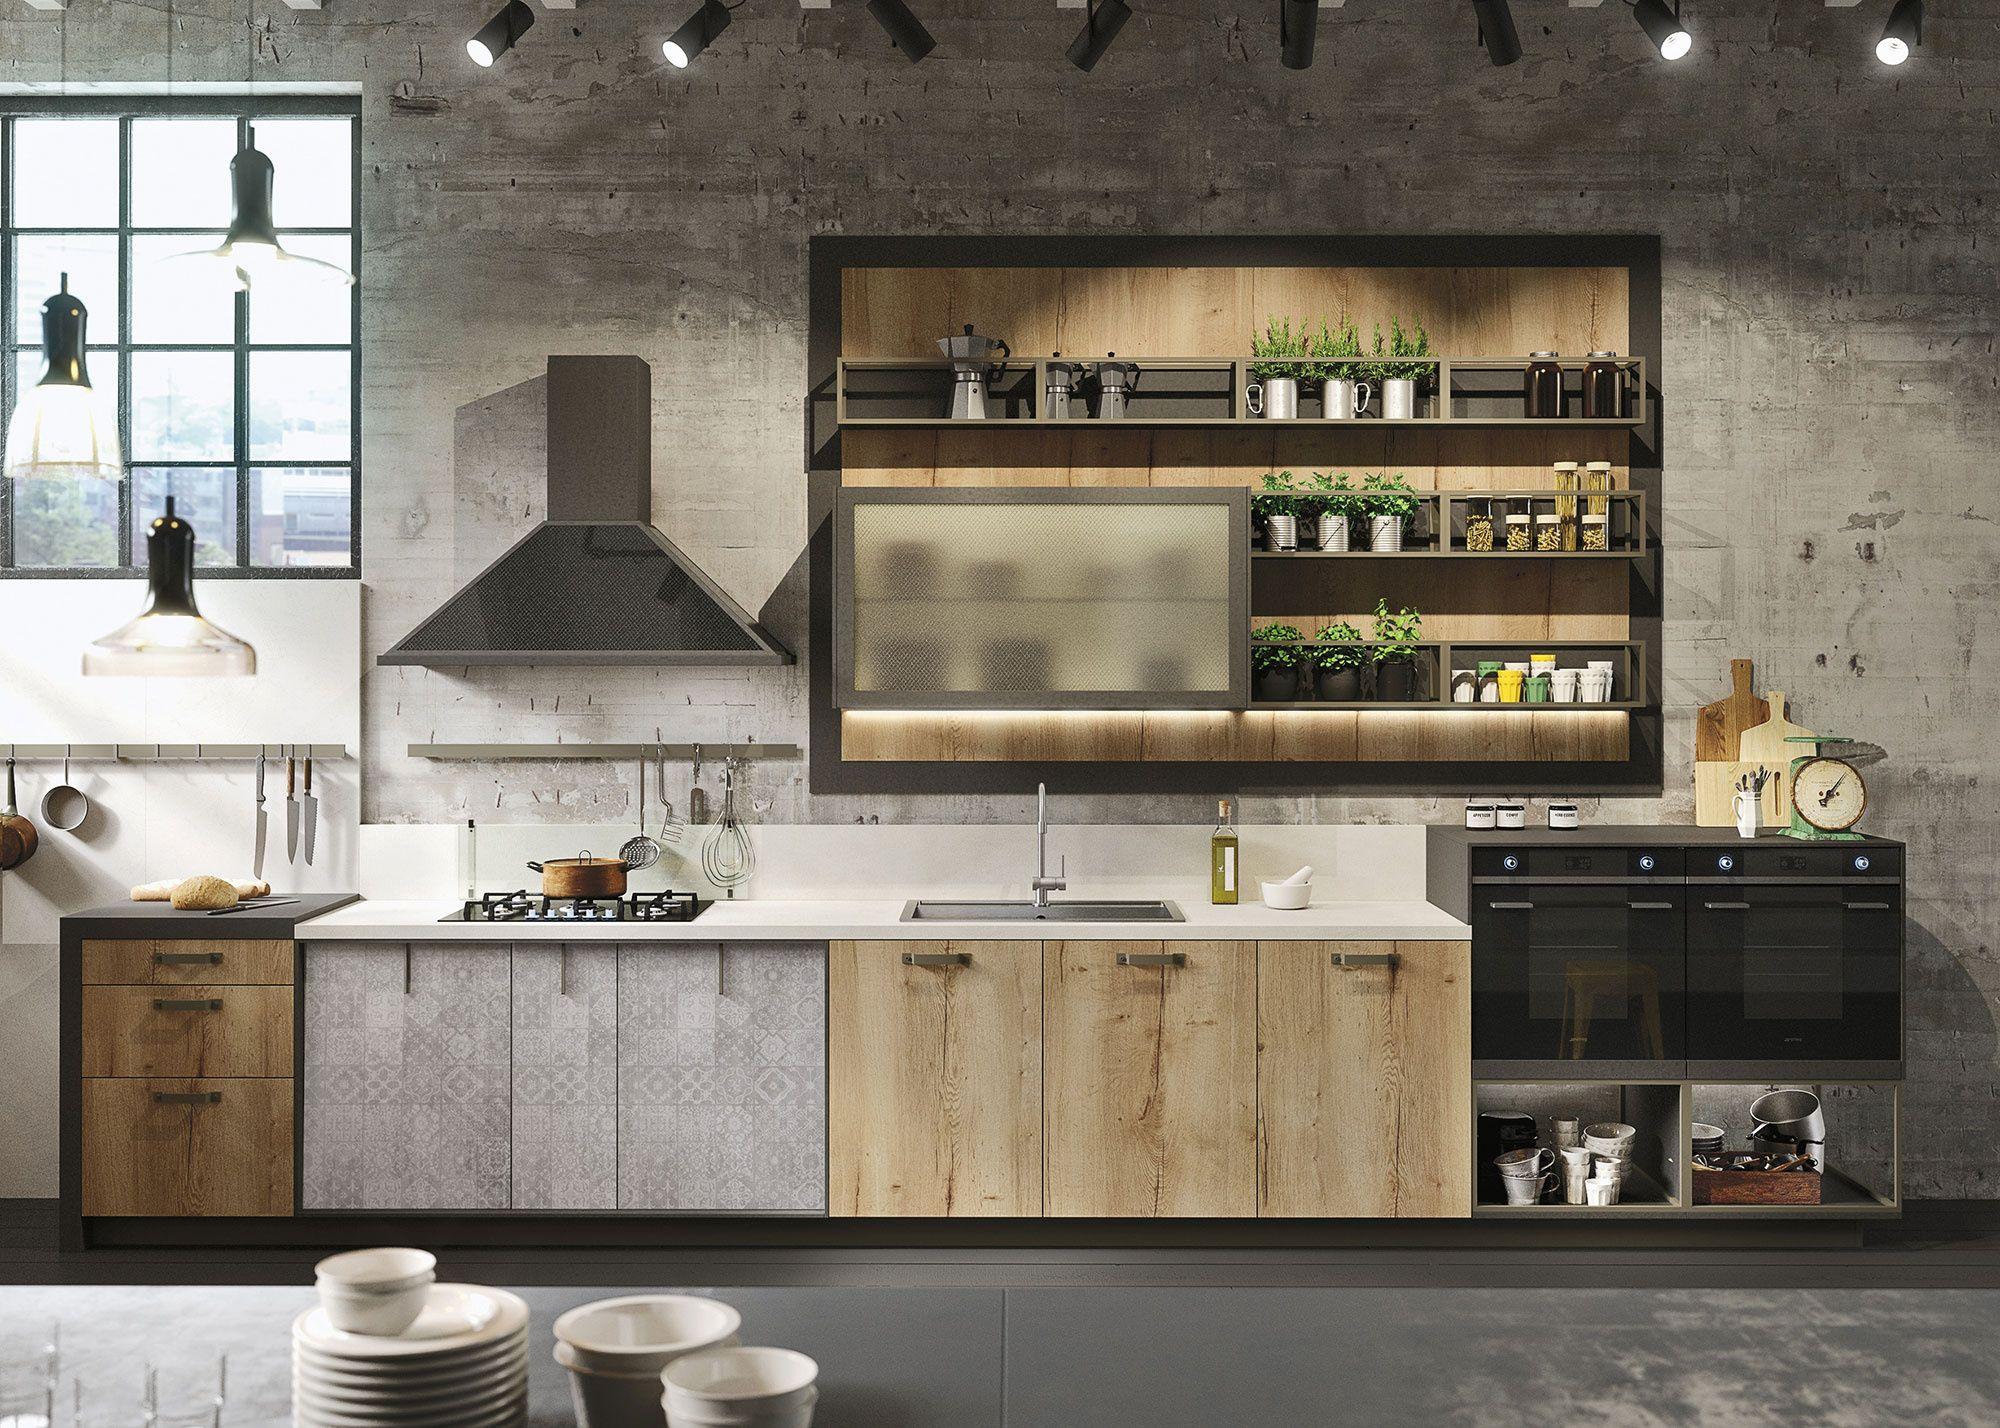 Kitchen Design for Lofts 9 Urban Ideas from Snaidero   Loft ...